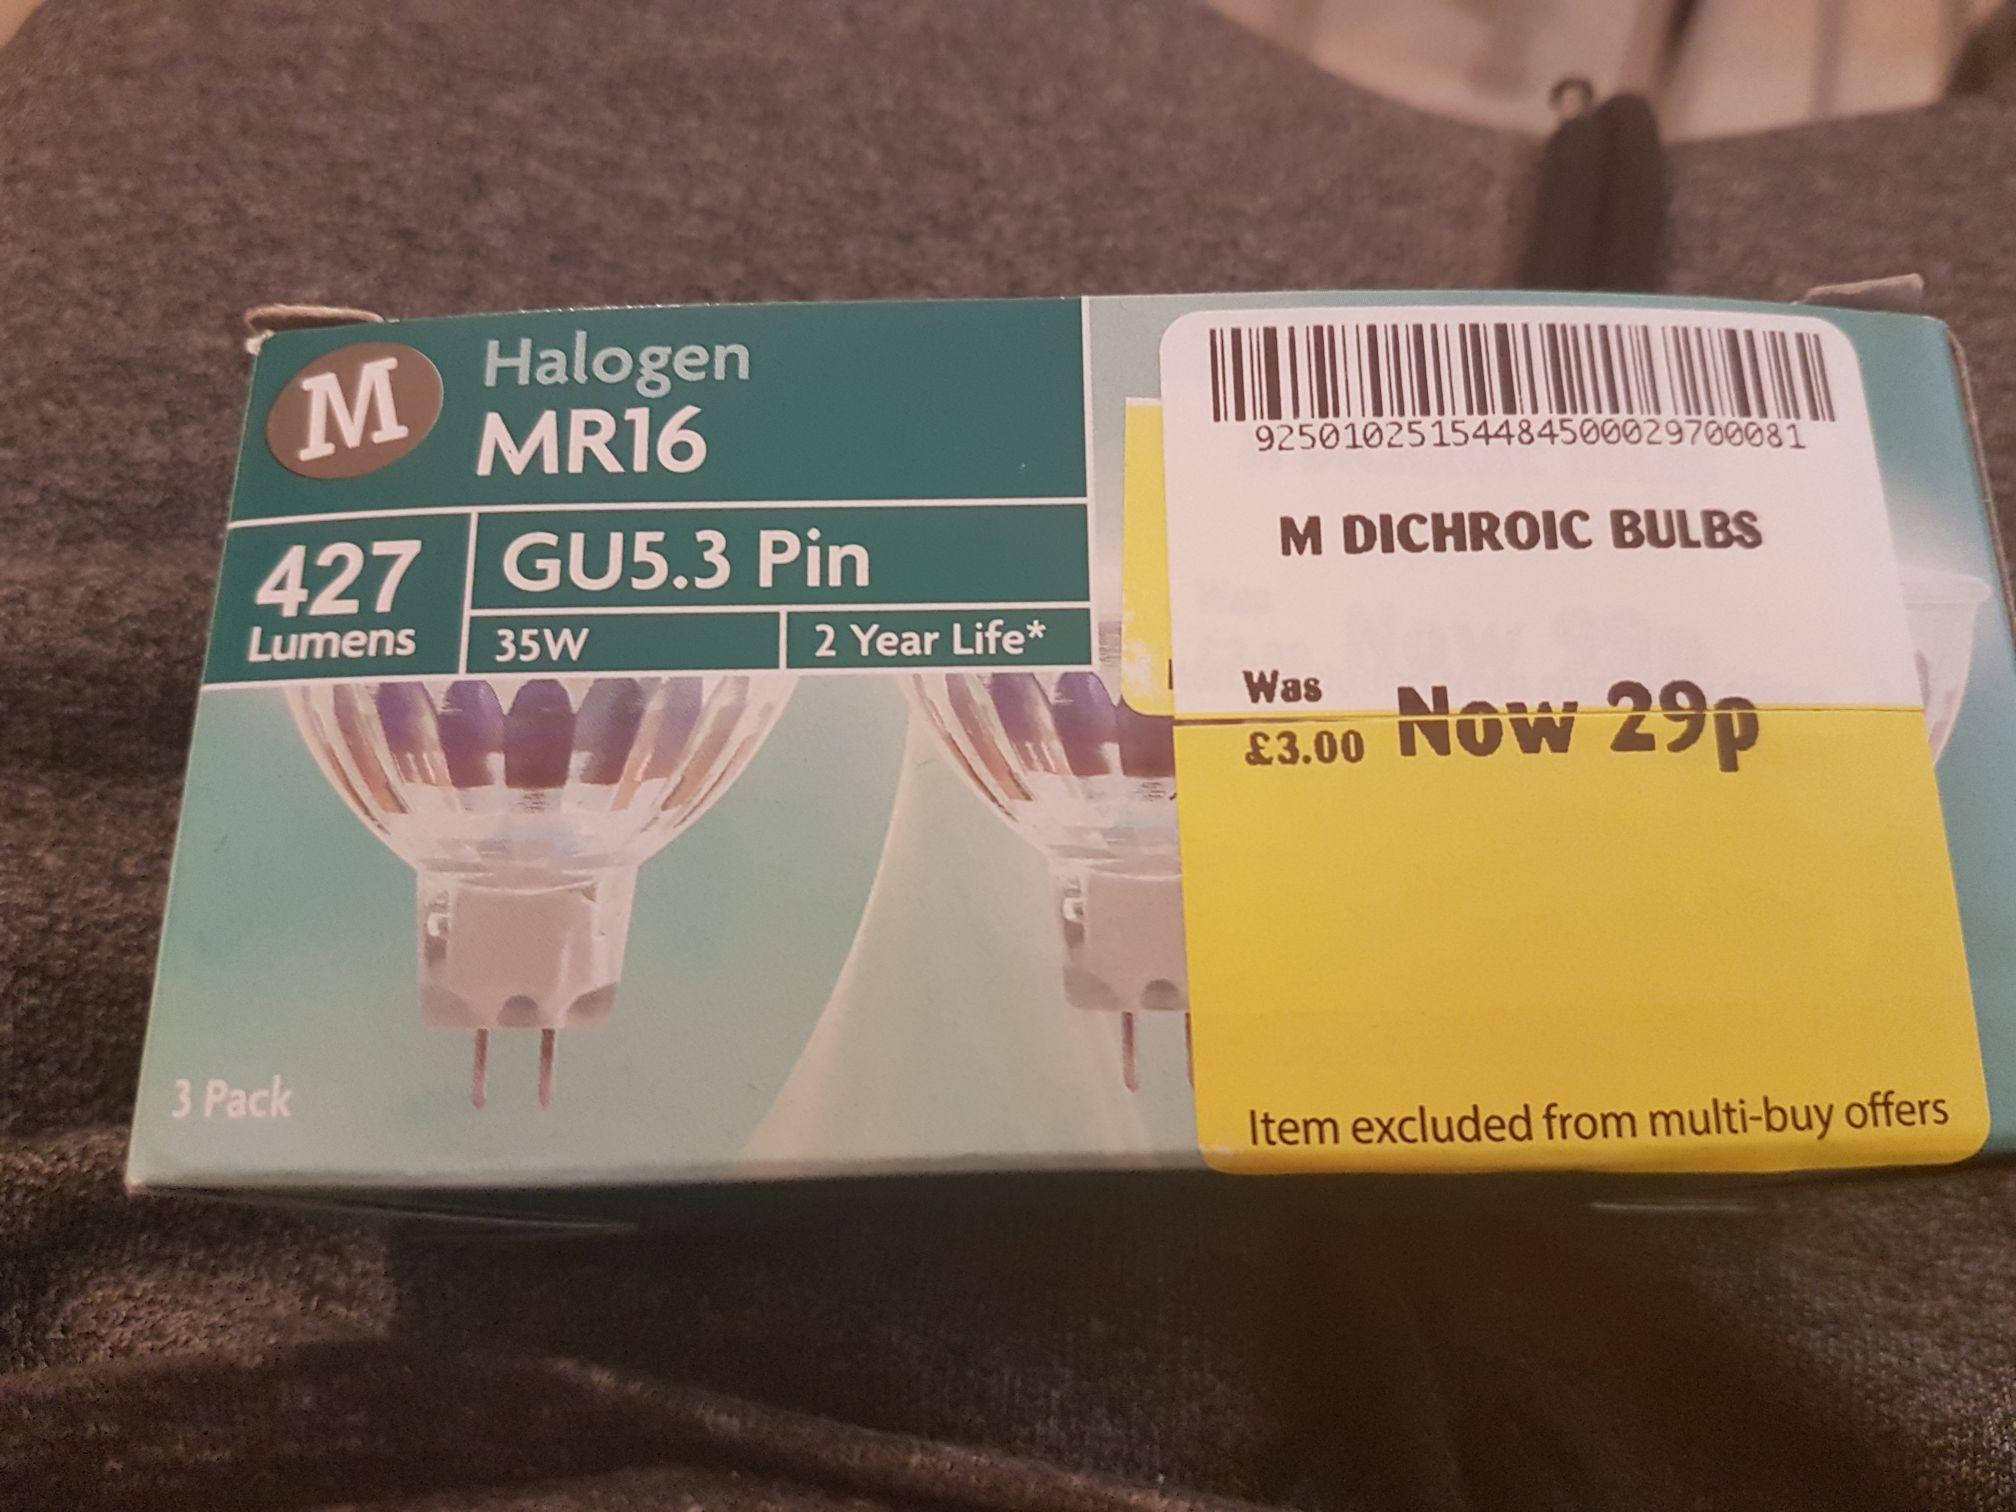 Halogen MR16 GU5.3 bulb 29p instore @ Morrisons